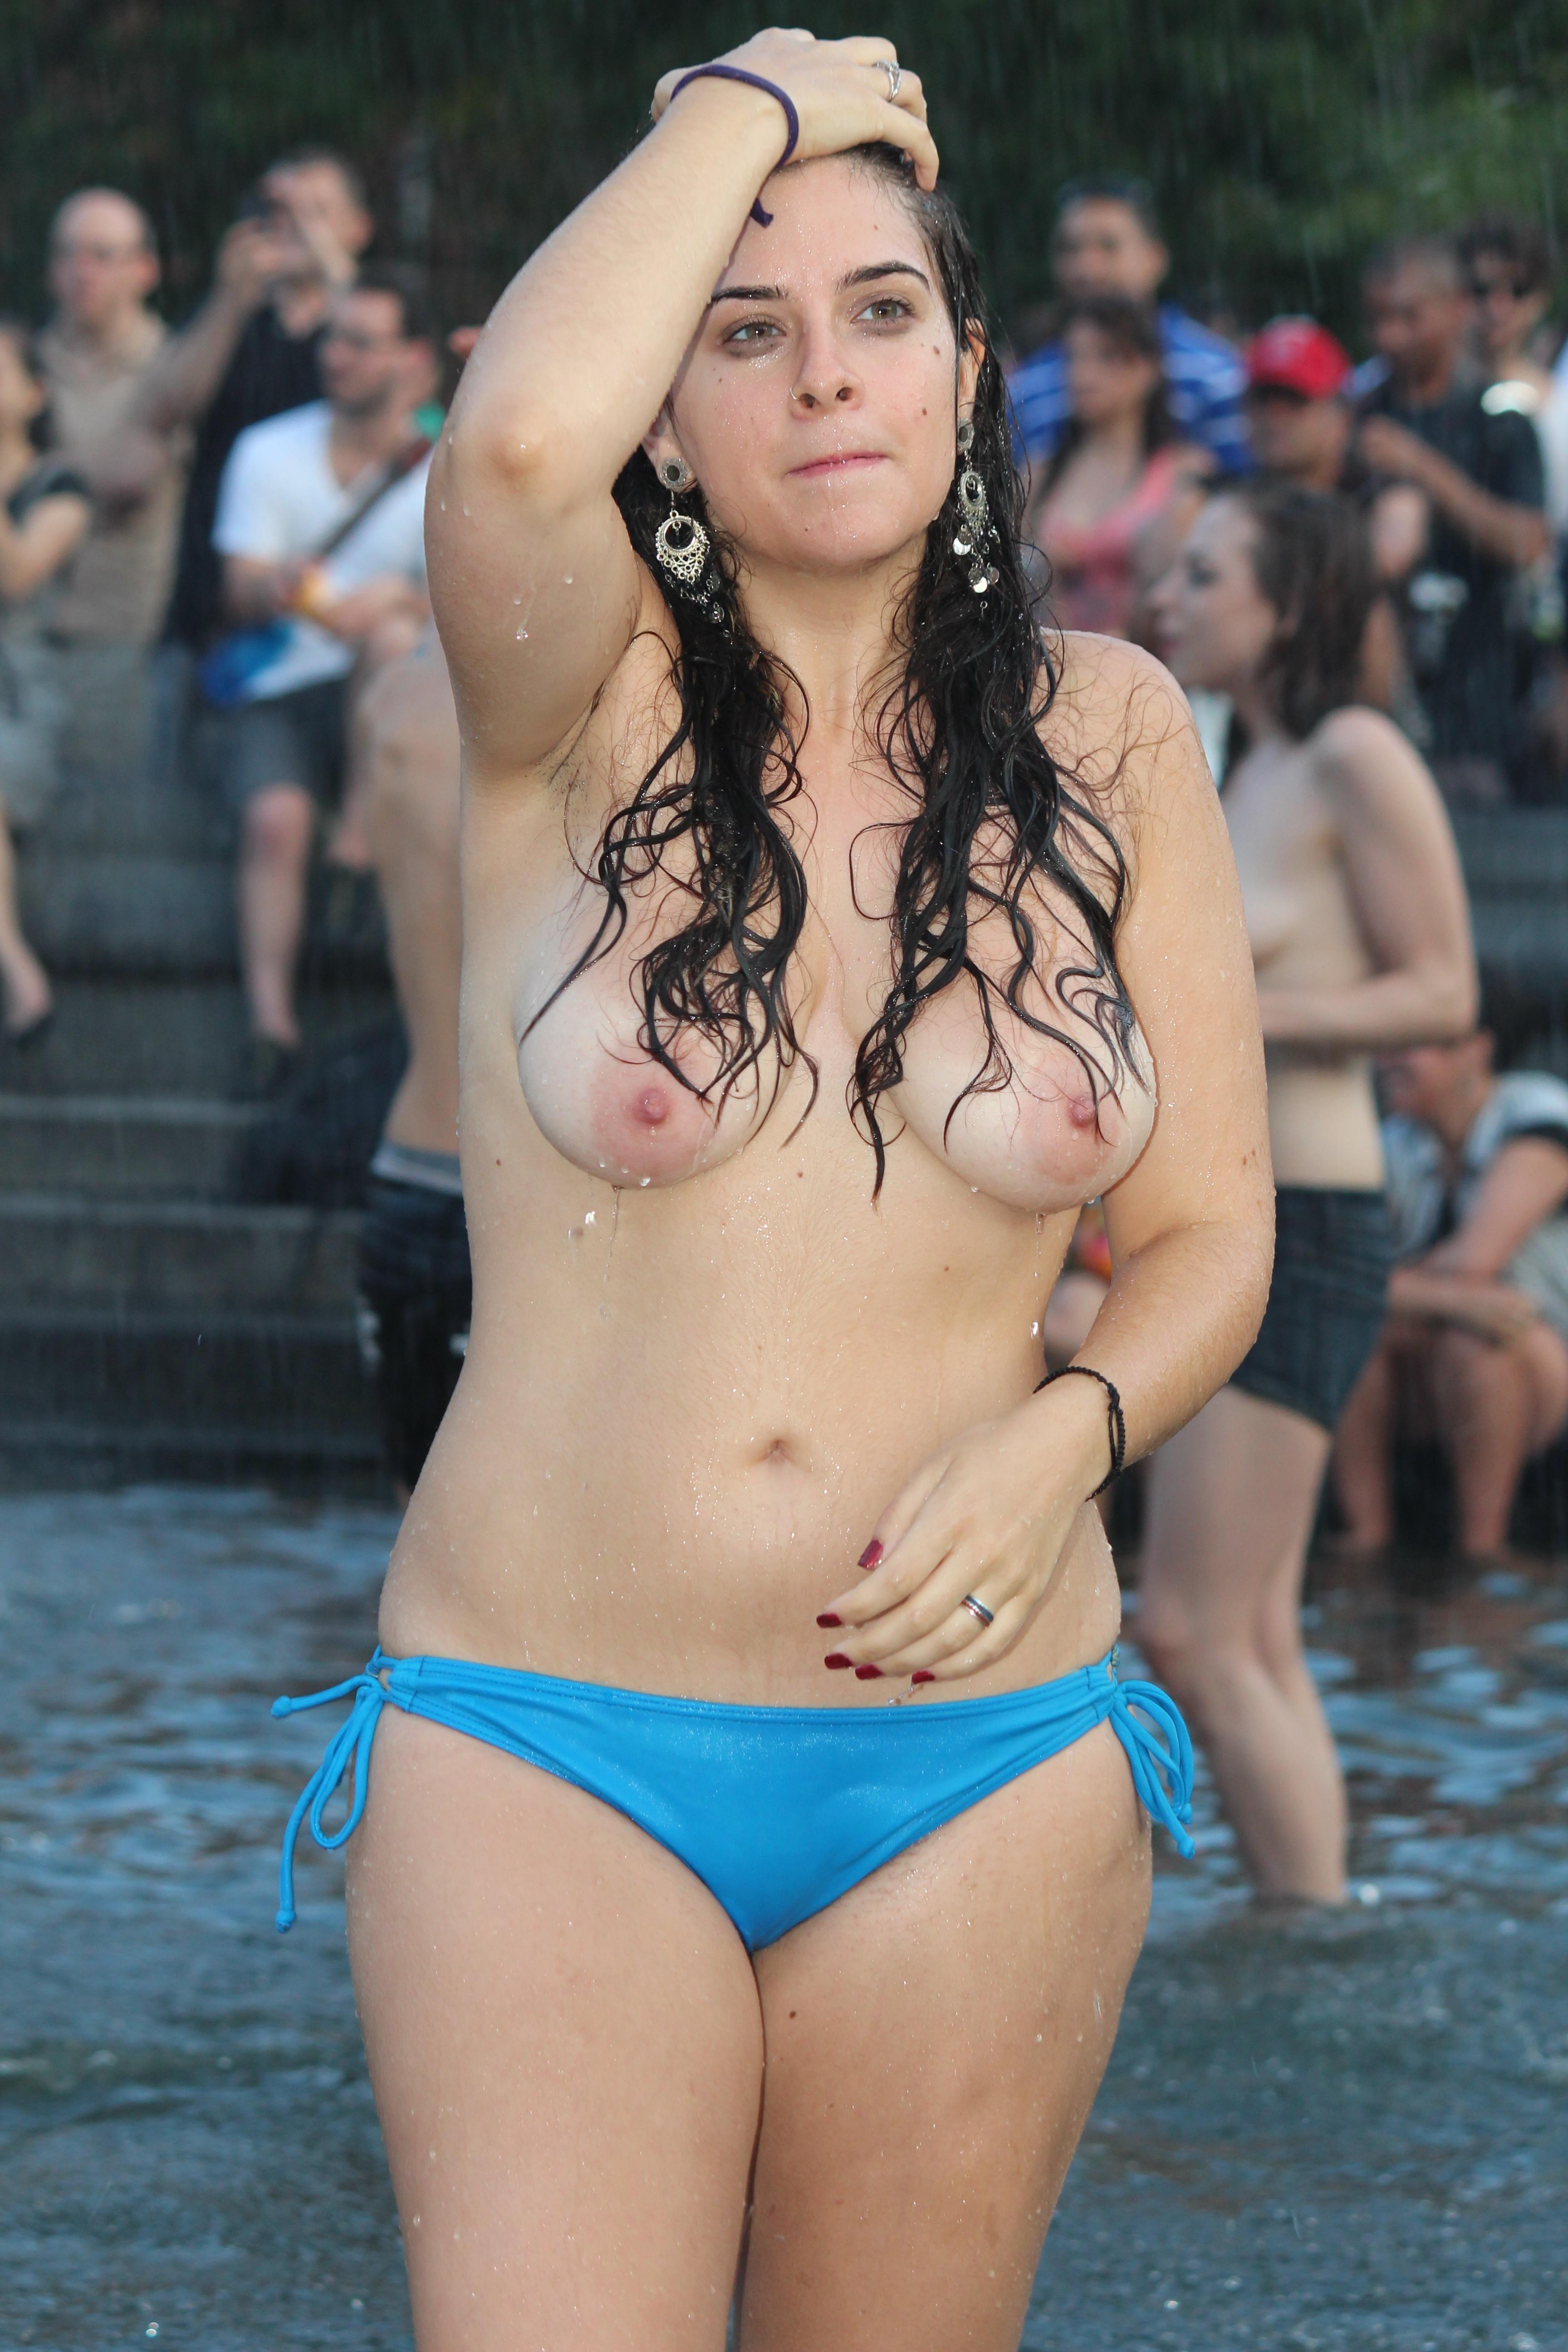 Dyke march nude girls